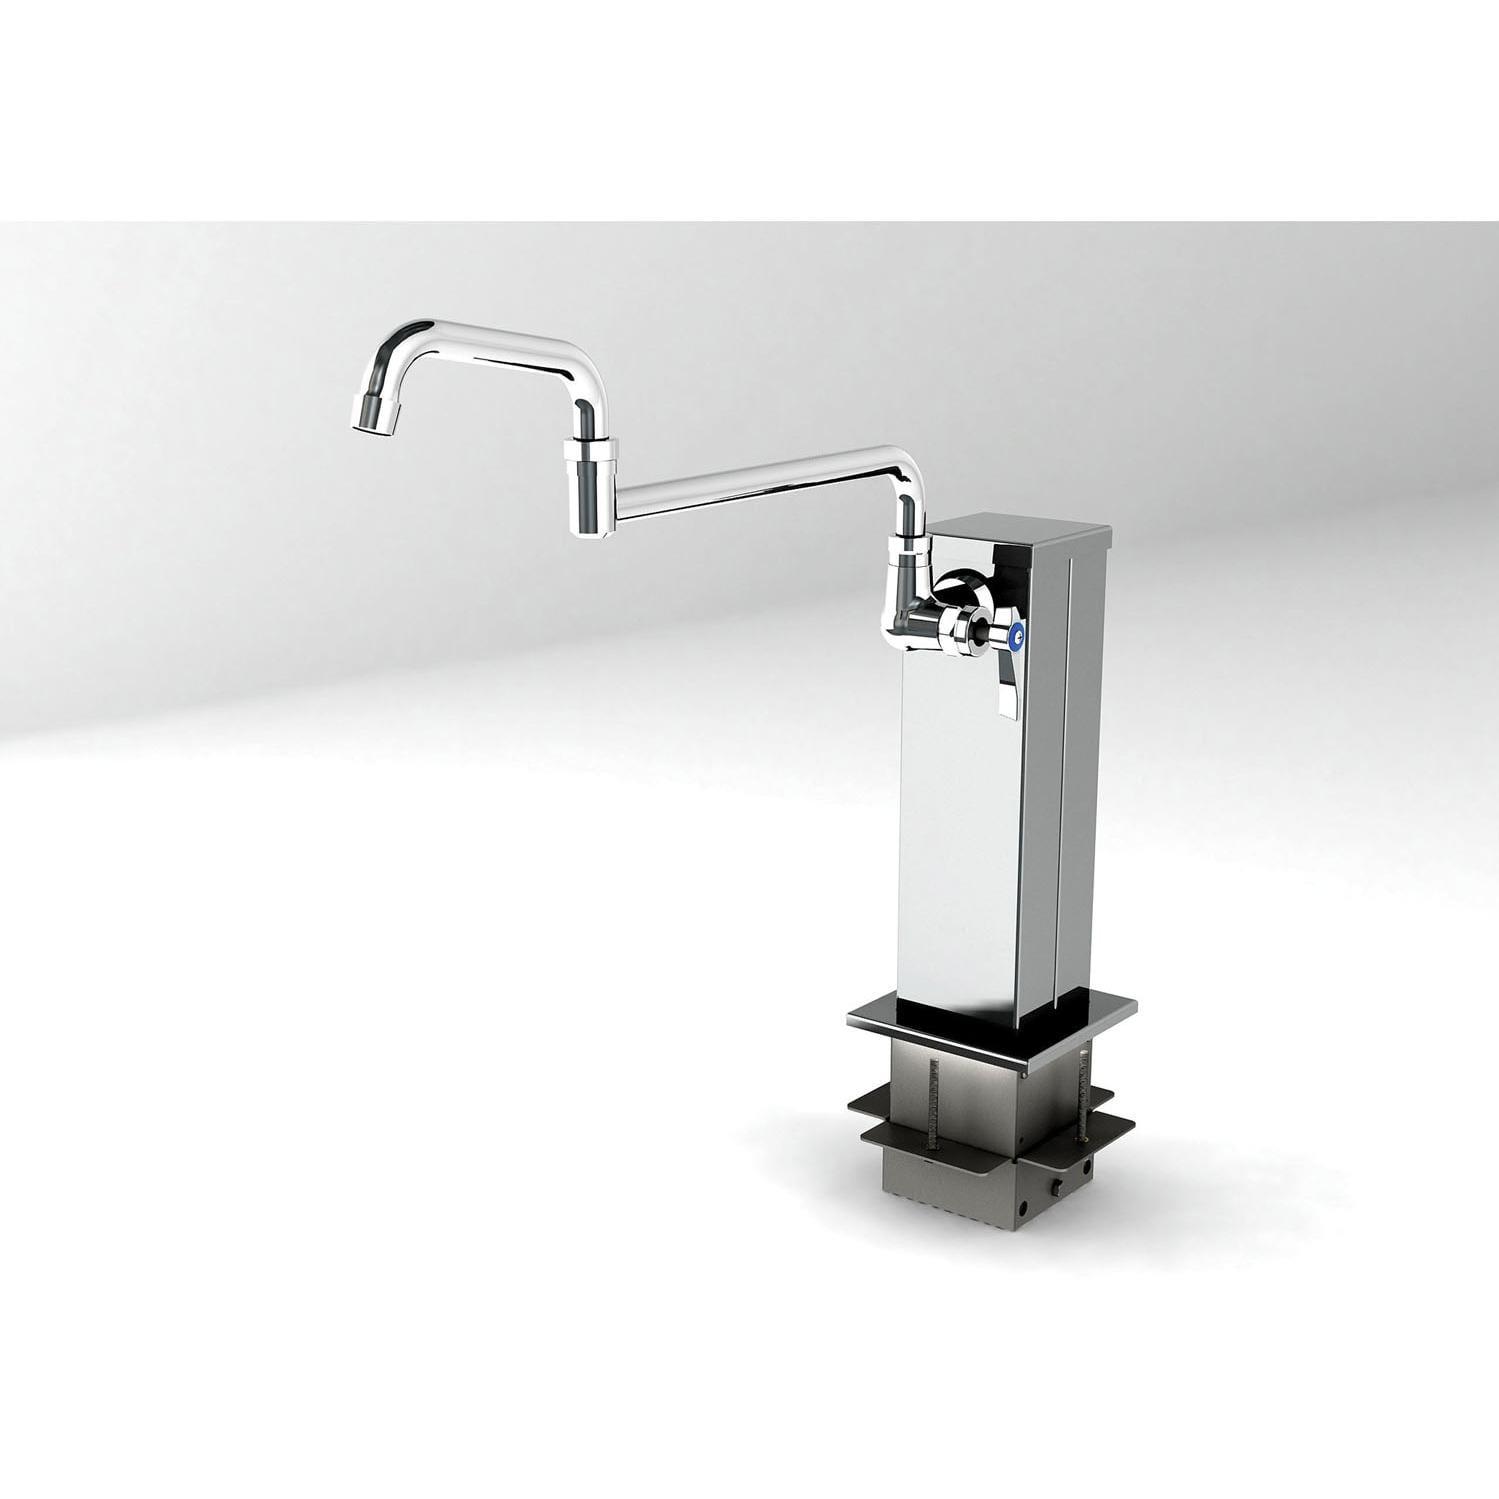 Alfresco Adjustable Pot Filler Tower With Faucet